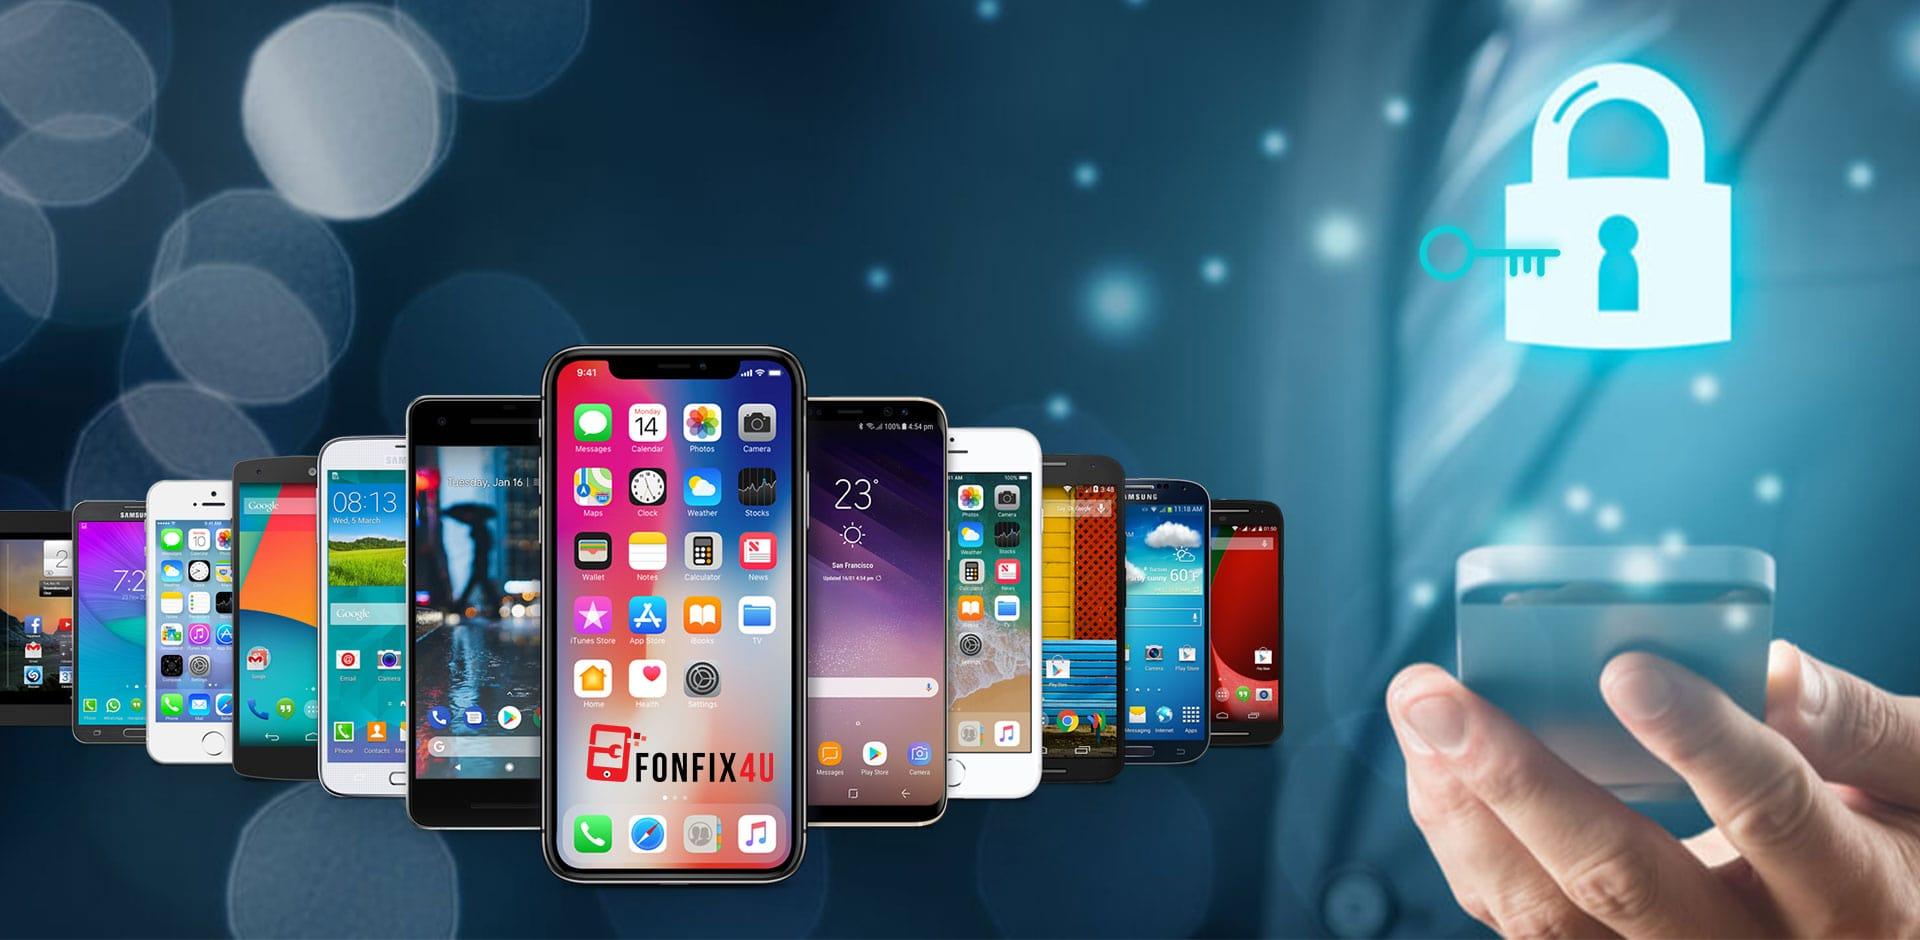 https://fonfix4u.co.uk/fonfix4u/Slider1/apple-iphone-screen-repair-near-me-in-oxford.jpg